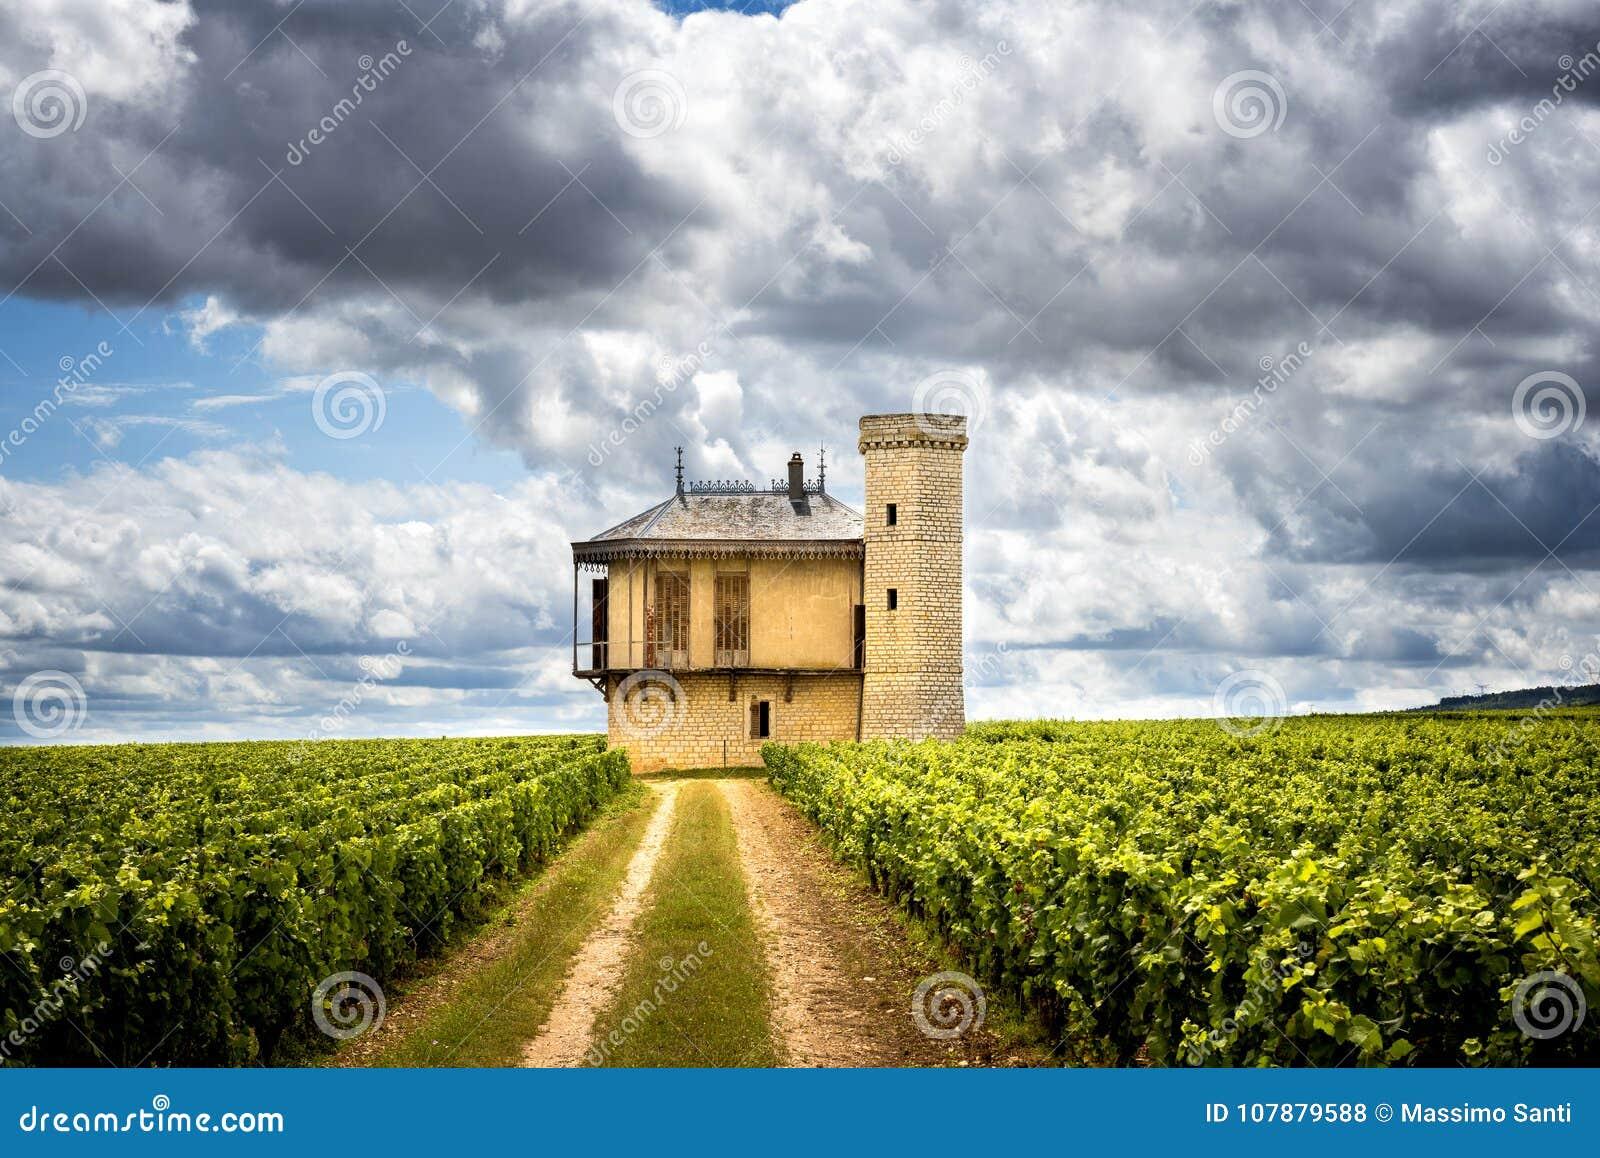 Borgonha, Castelo de La Visita e vinhedos, Clos de Vougeot france